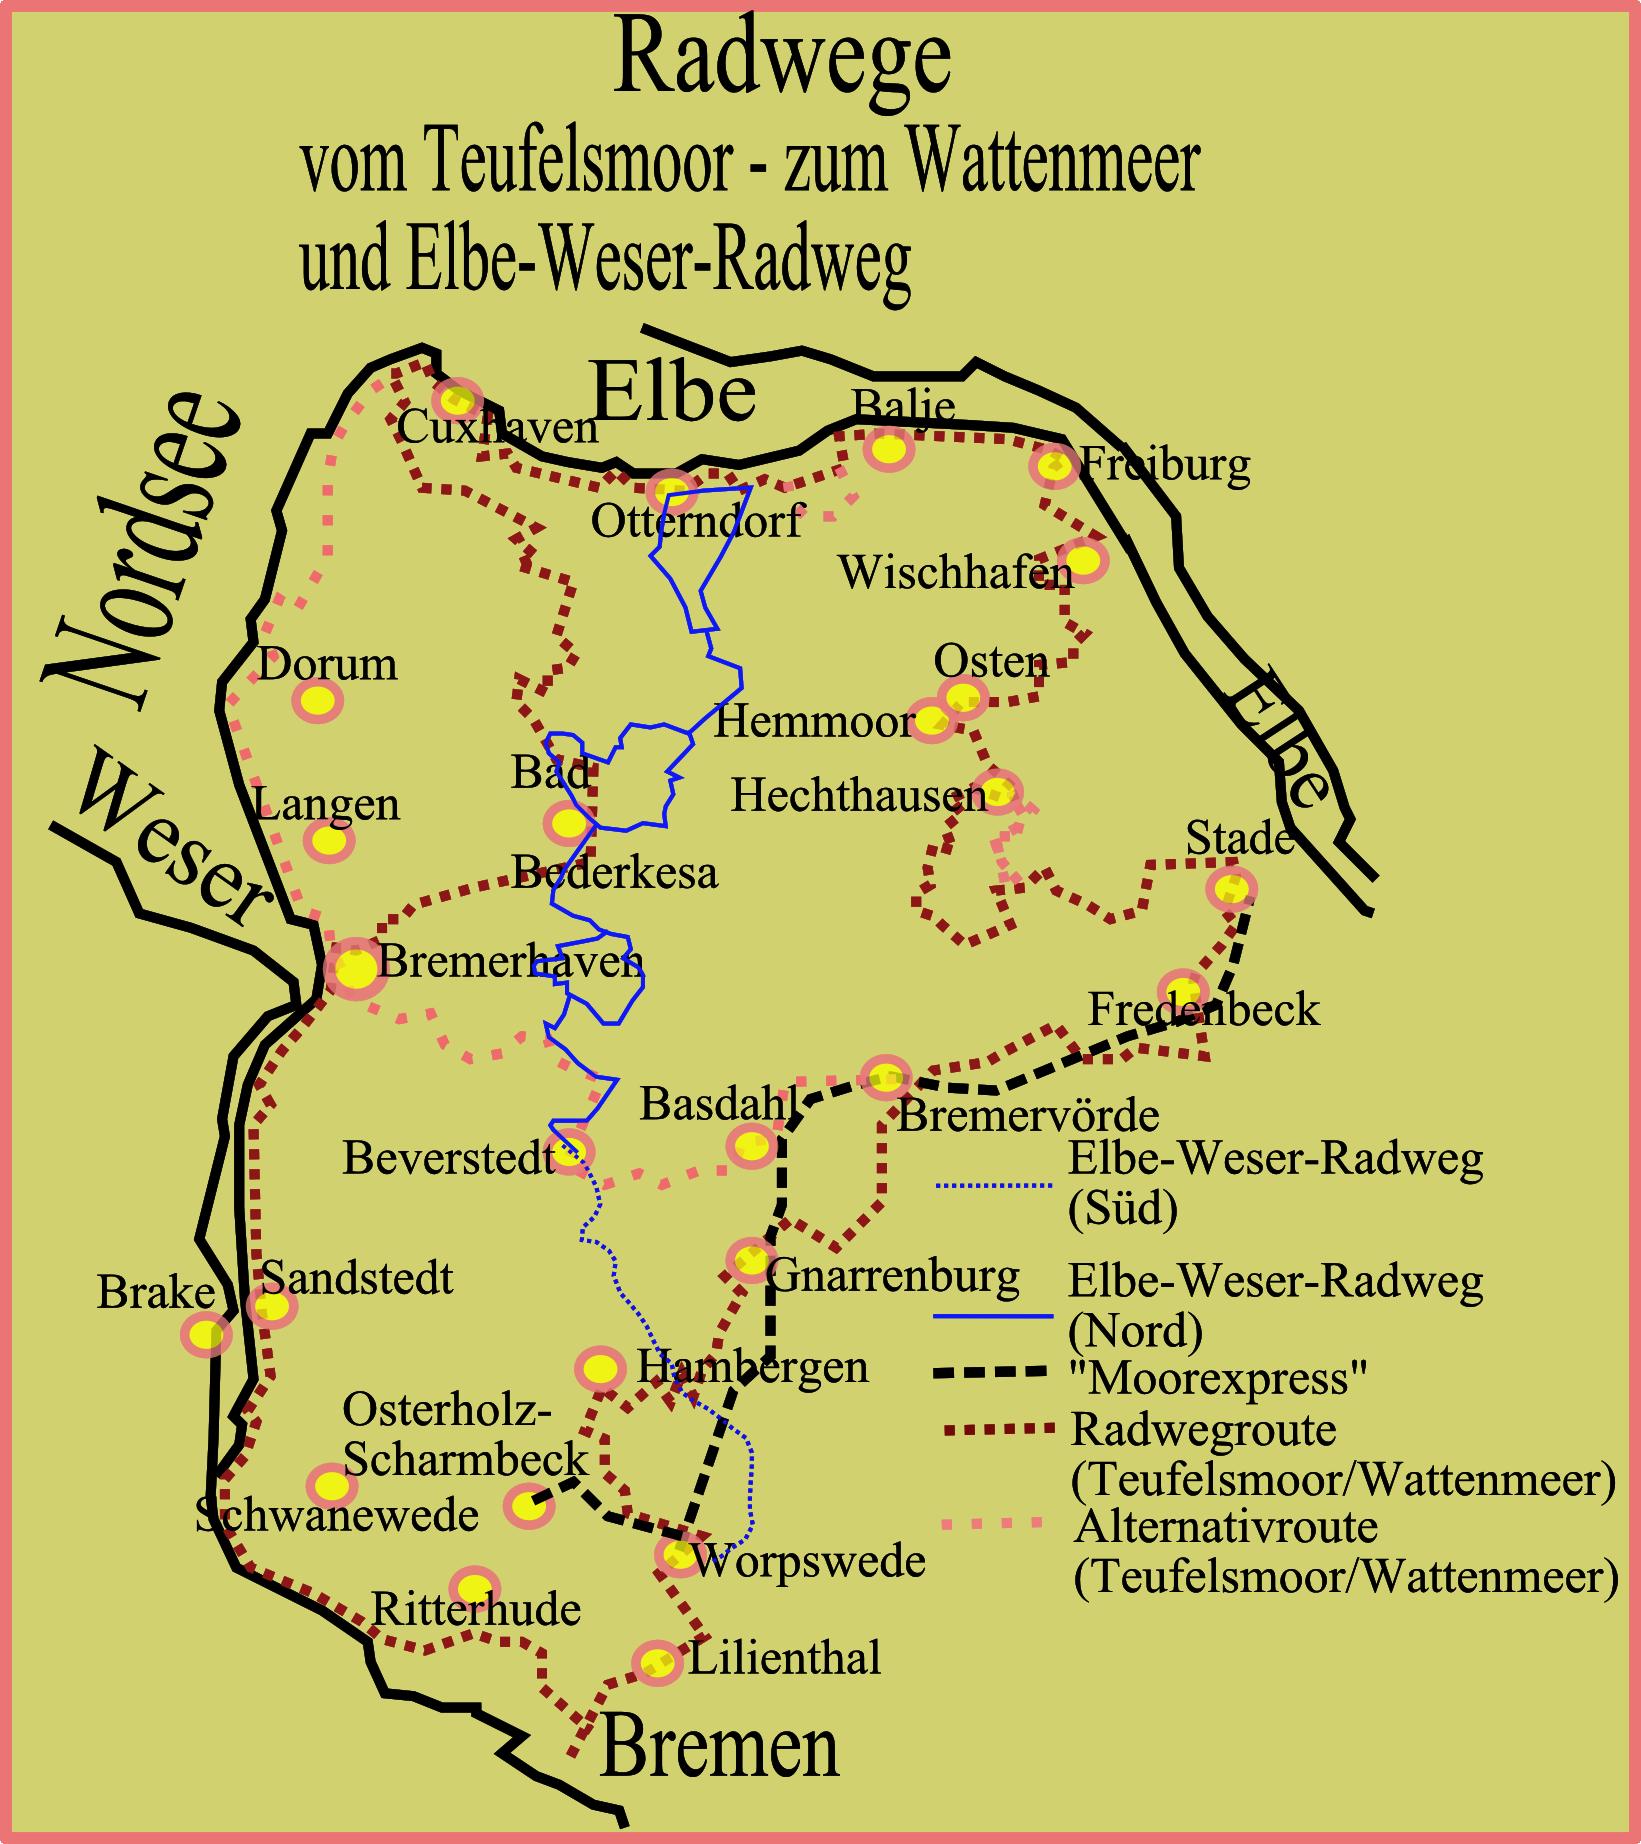 Weser Radweg Karte Pdf.Elbe Weser Radweg Wikipedia